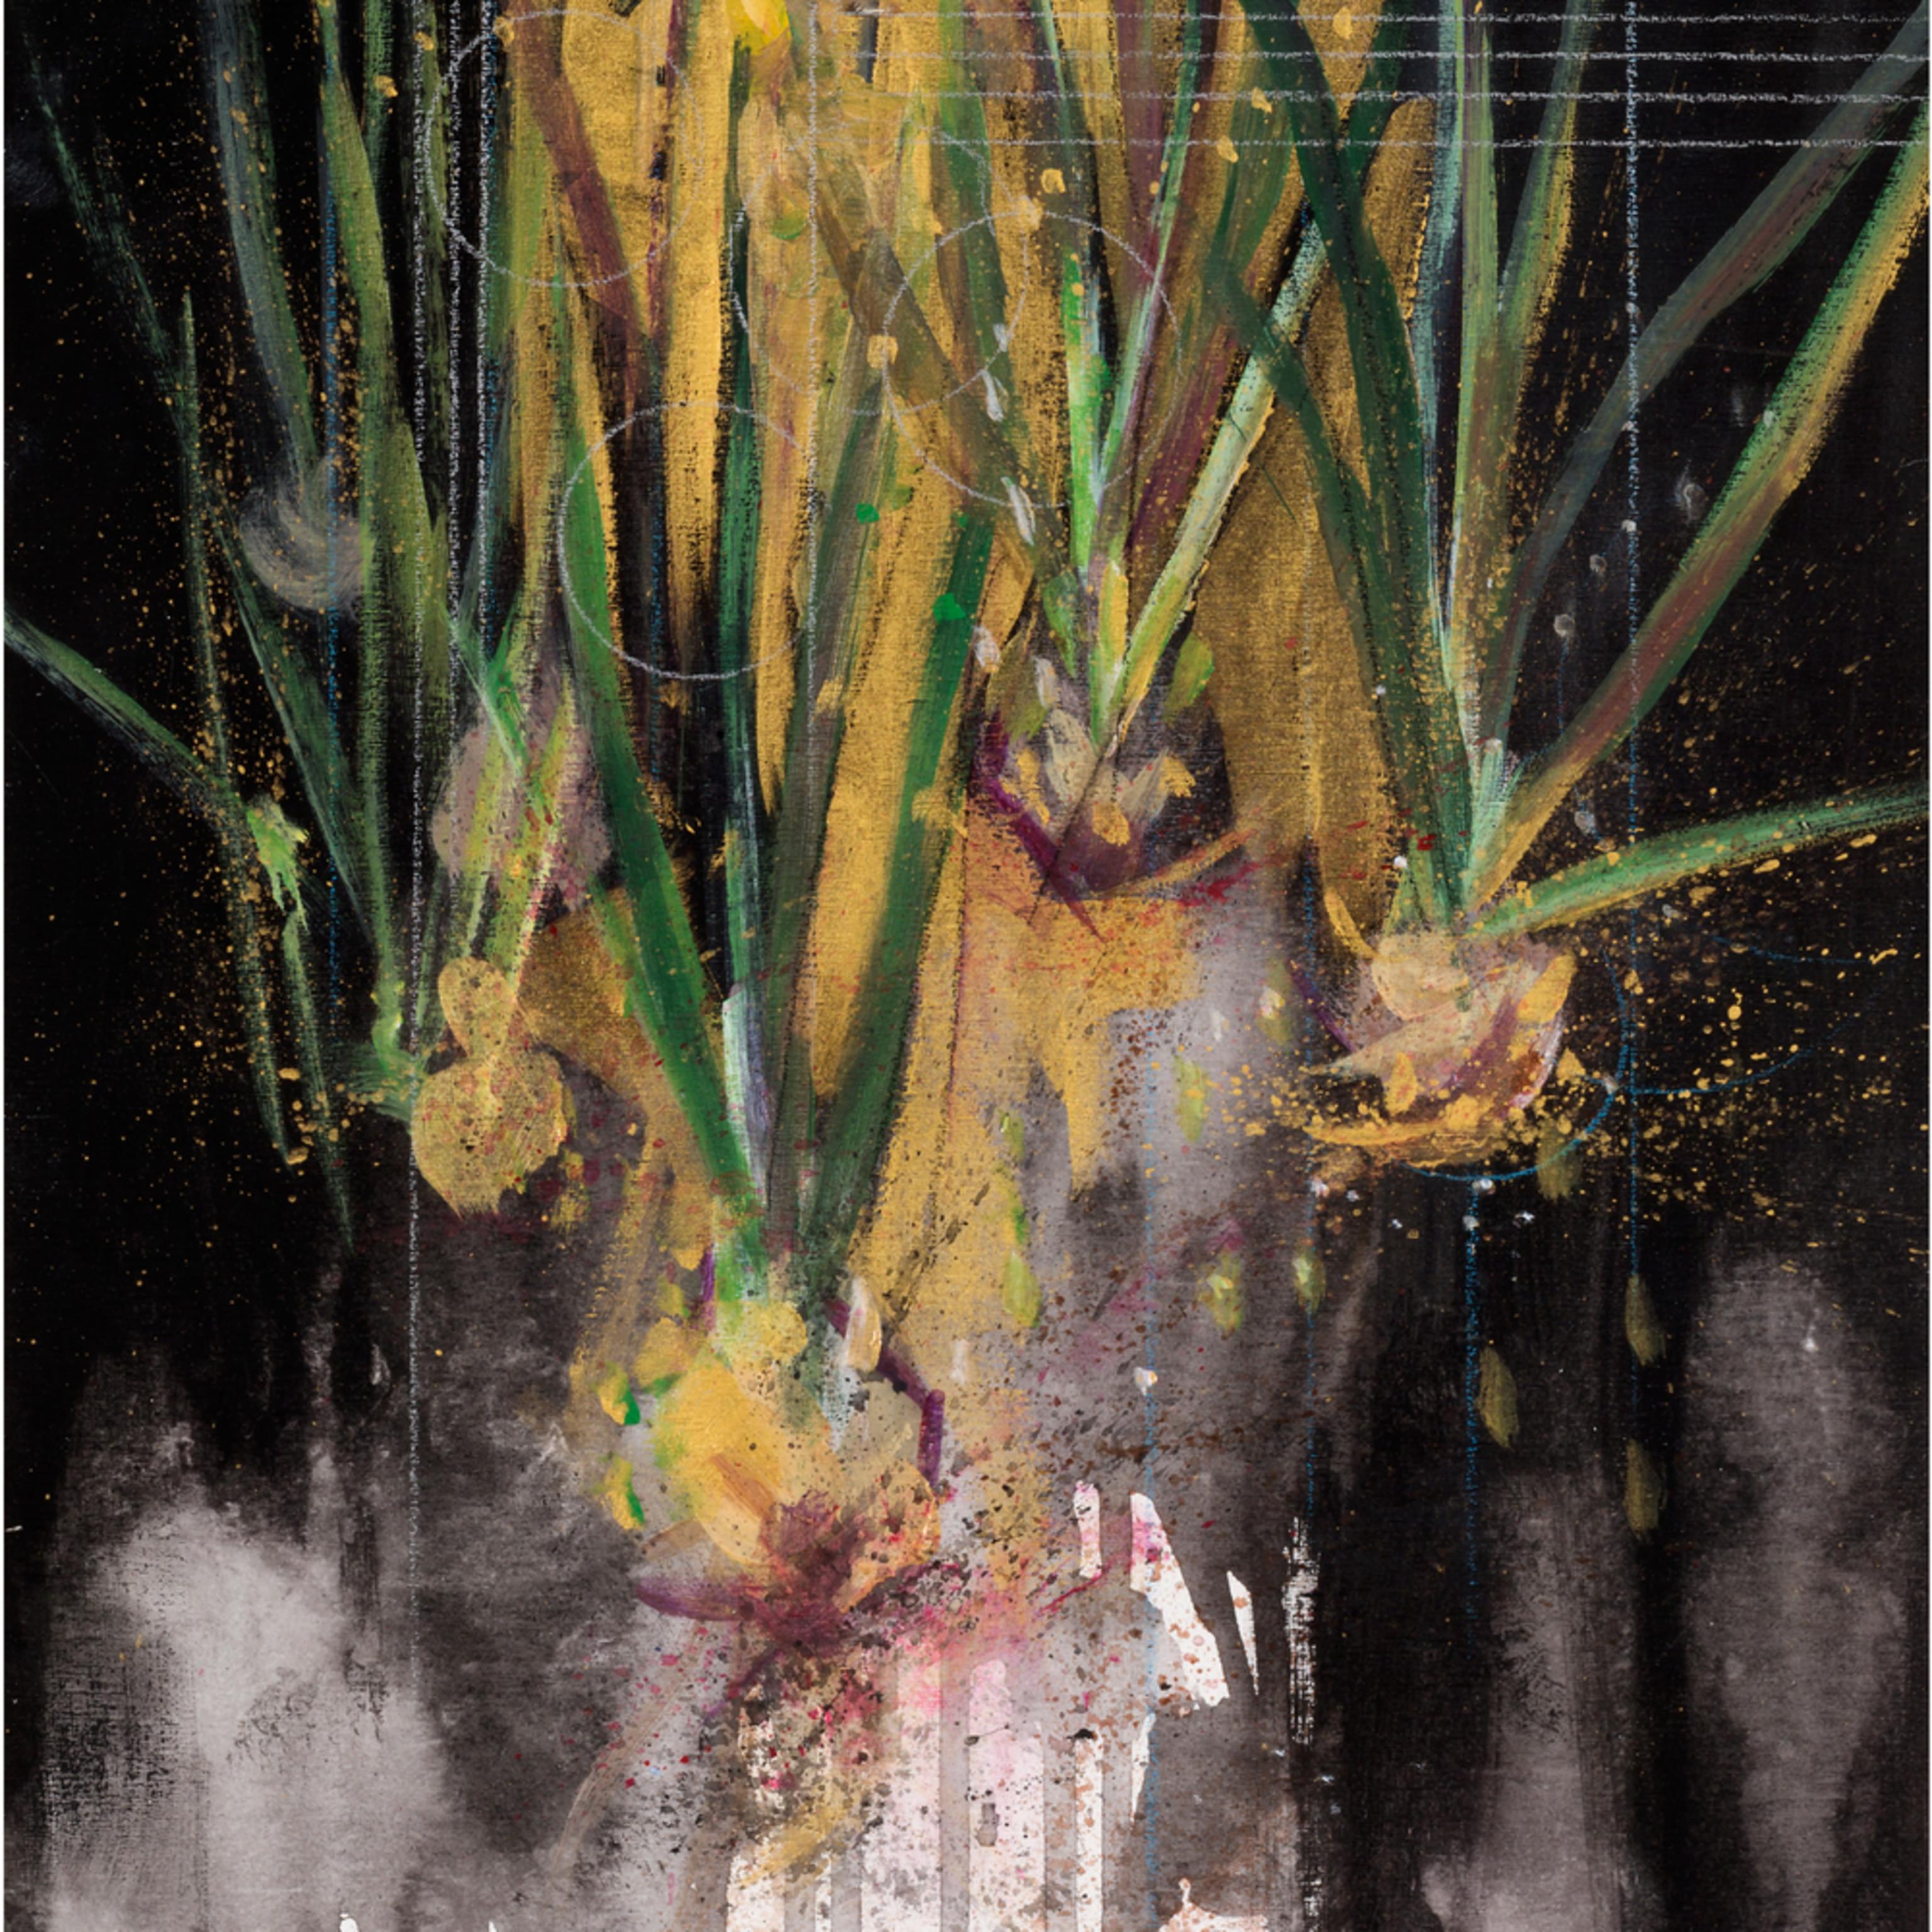 The chorus   daffodils ocqpm3